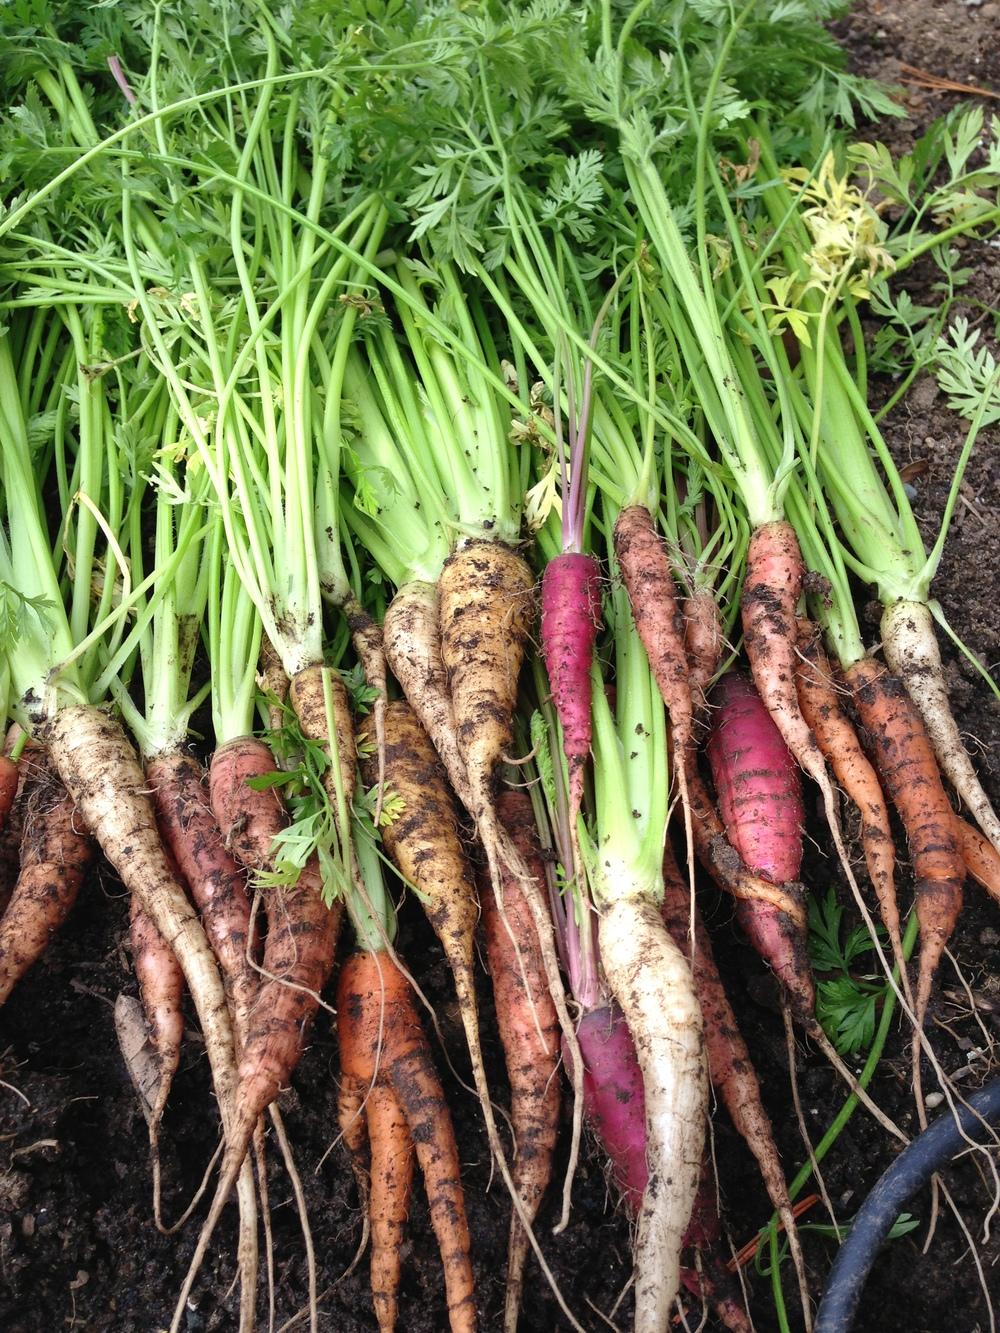 Garden_Carrots2_2014-02-17 13.50.34.jpg